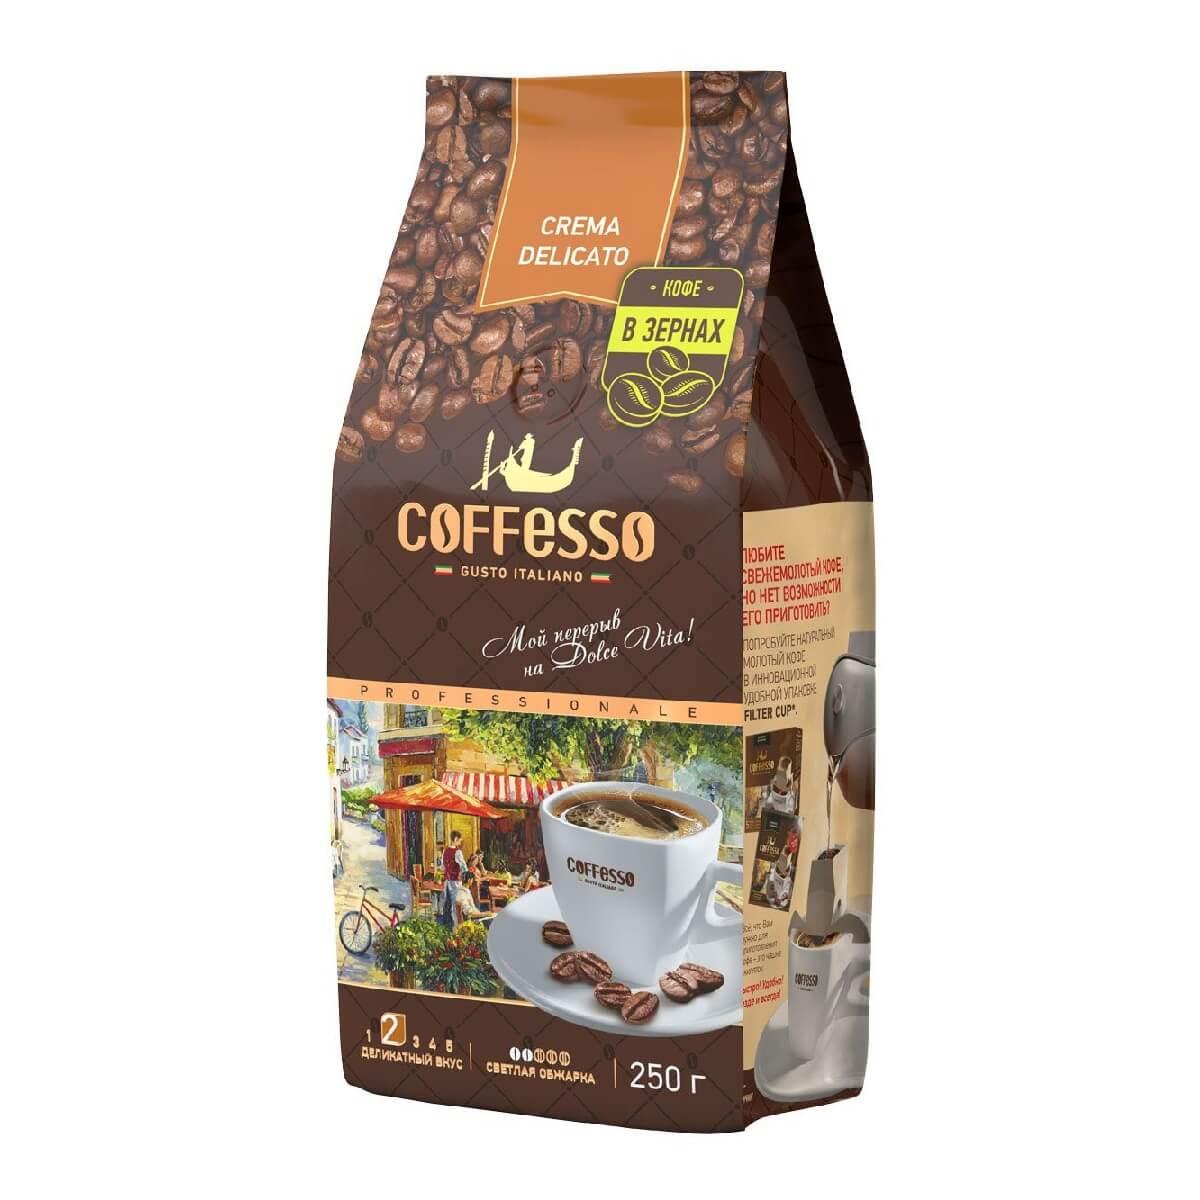 Кофе в зернах Coffesso Crema Delicato 250 г фото